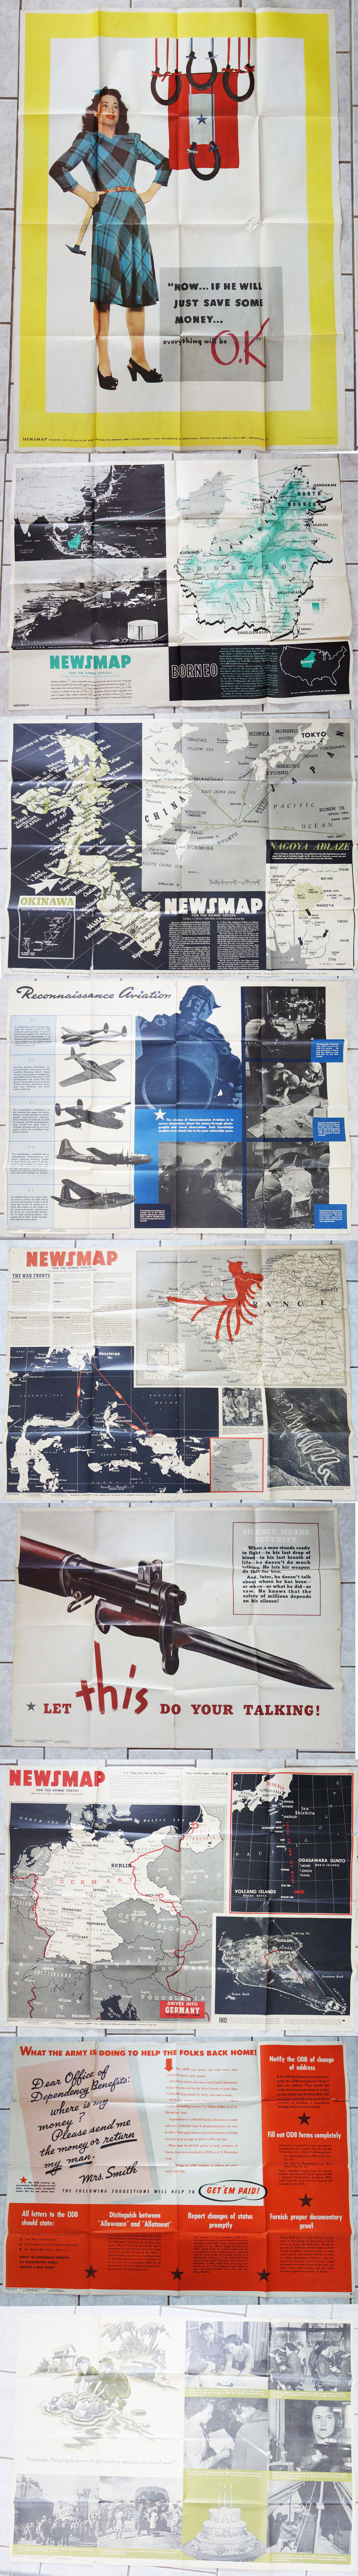 12 US Propaganda Posters